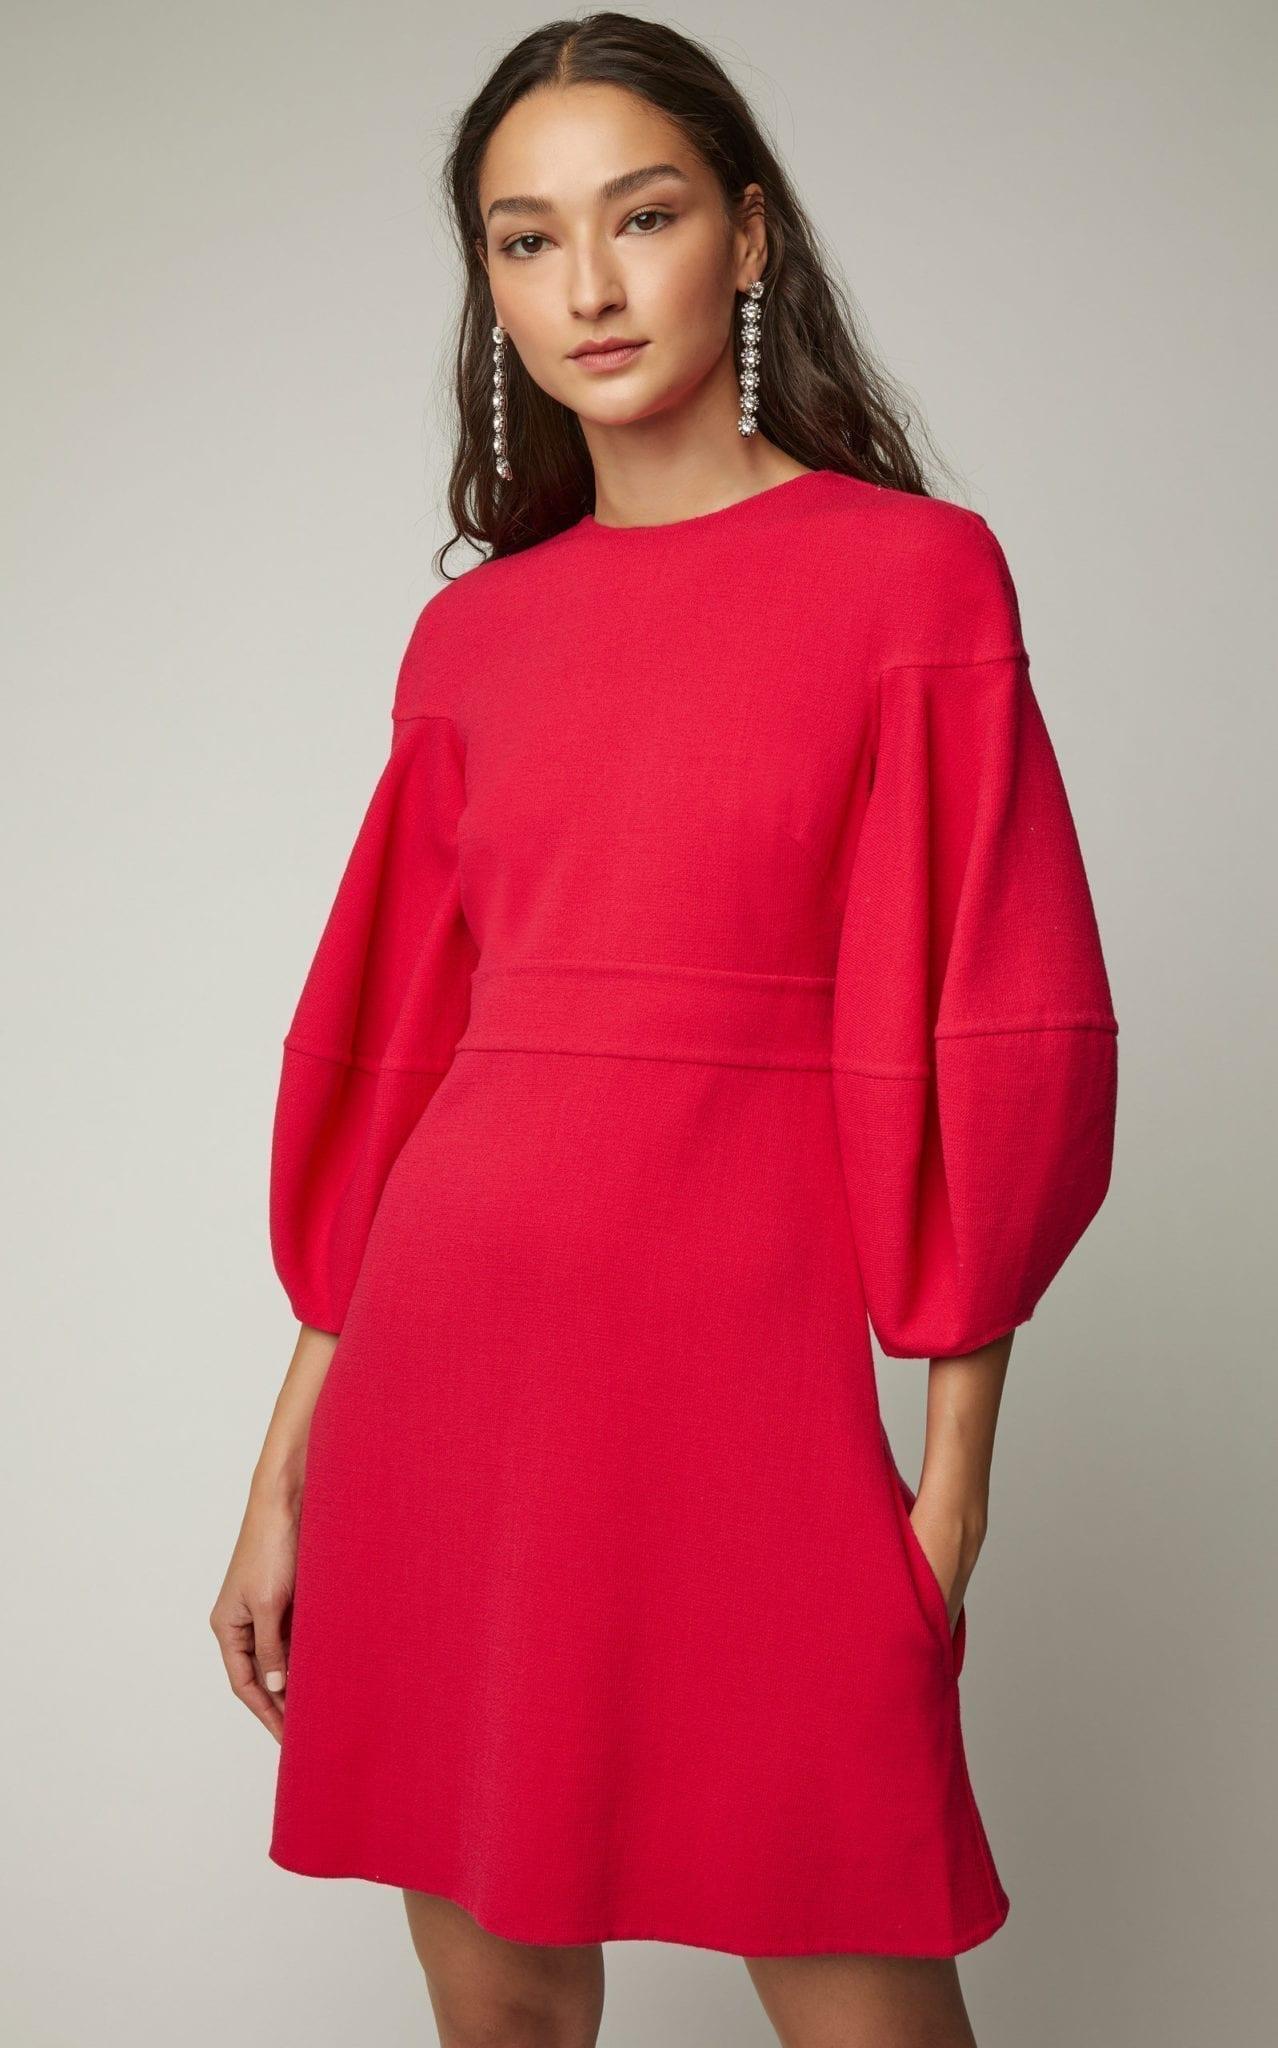 OSCAR DE LA RENTA Fluted Wool-Blend Cady Mini Red Dress